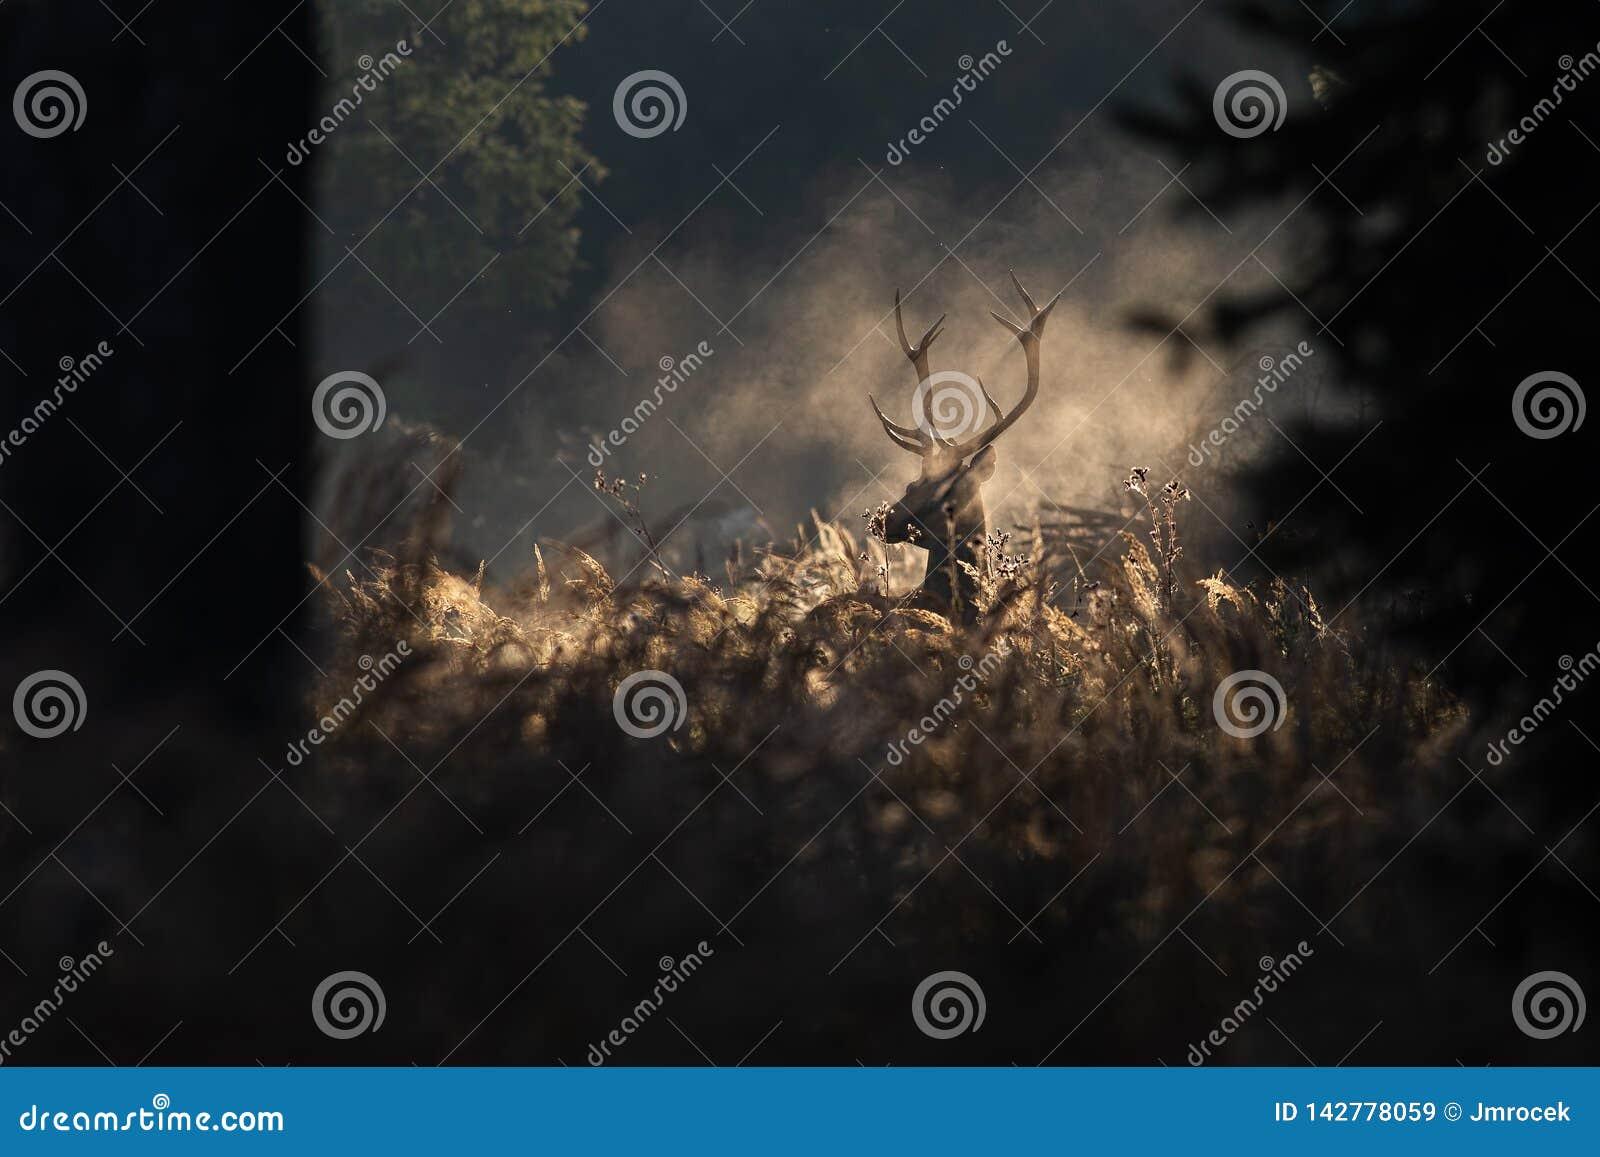 Red deer stag in mornig autumn mist